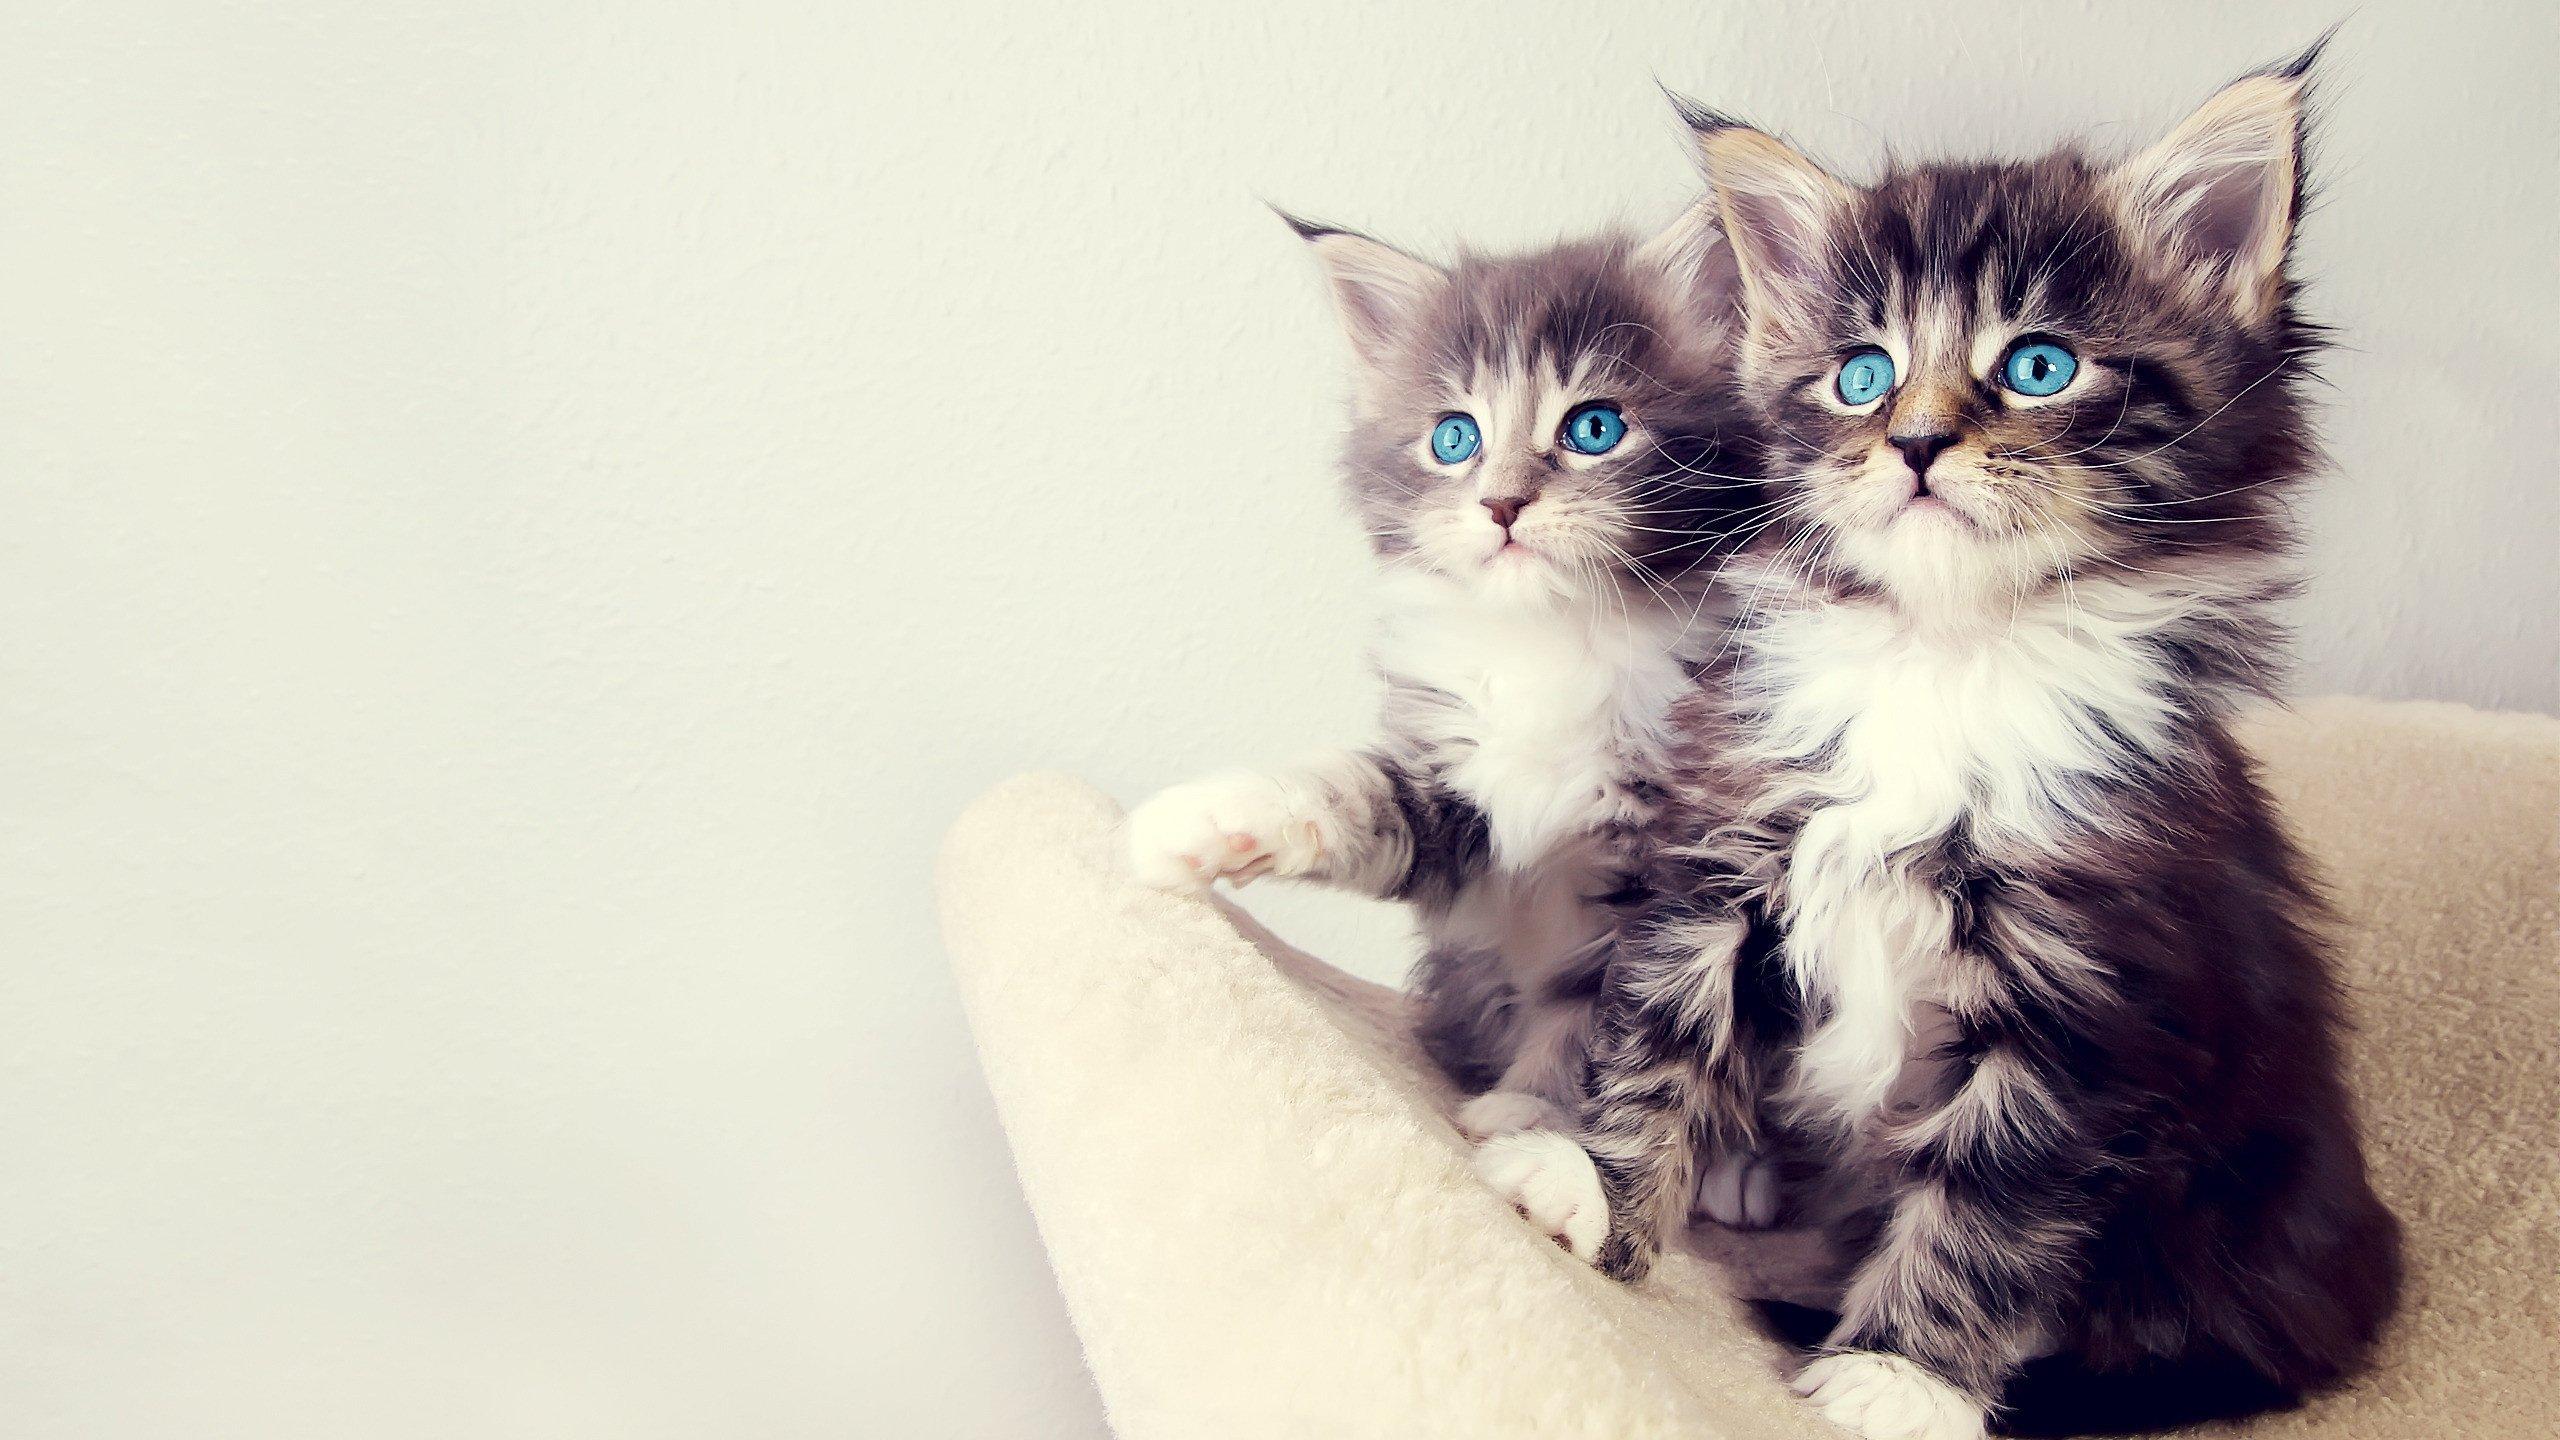 котенок взгляд милый kitten view cute бесплатно